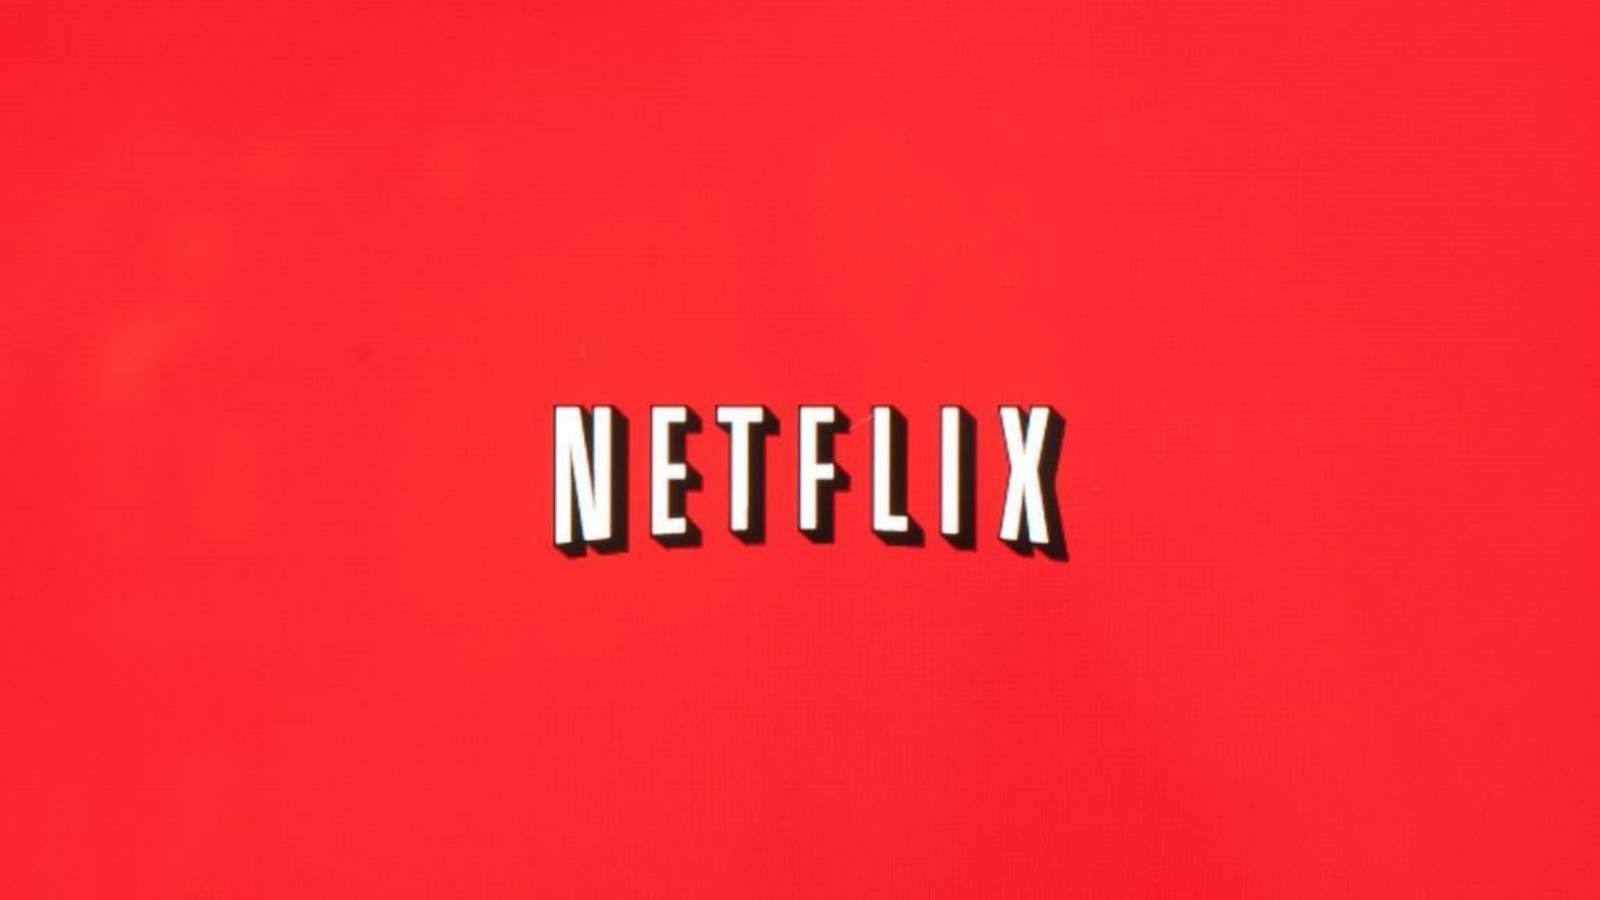 Netflix galerie